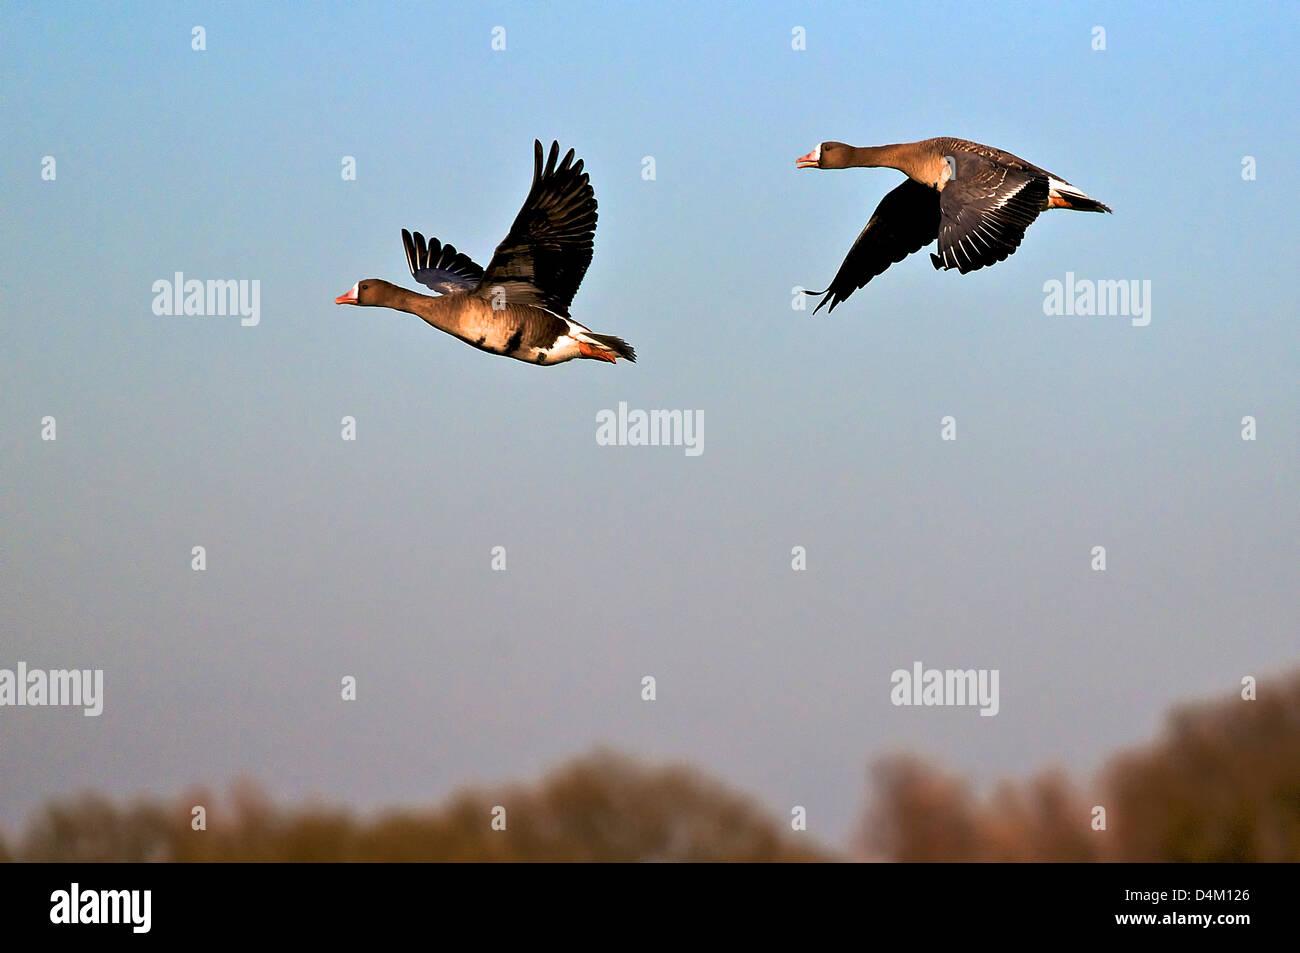 Flying Greater White Fronted Geese at the lower Rhine. Blässgänse im Flug am Niederrhein. - Stock Image